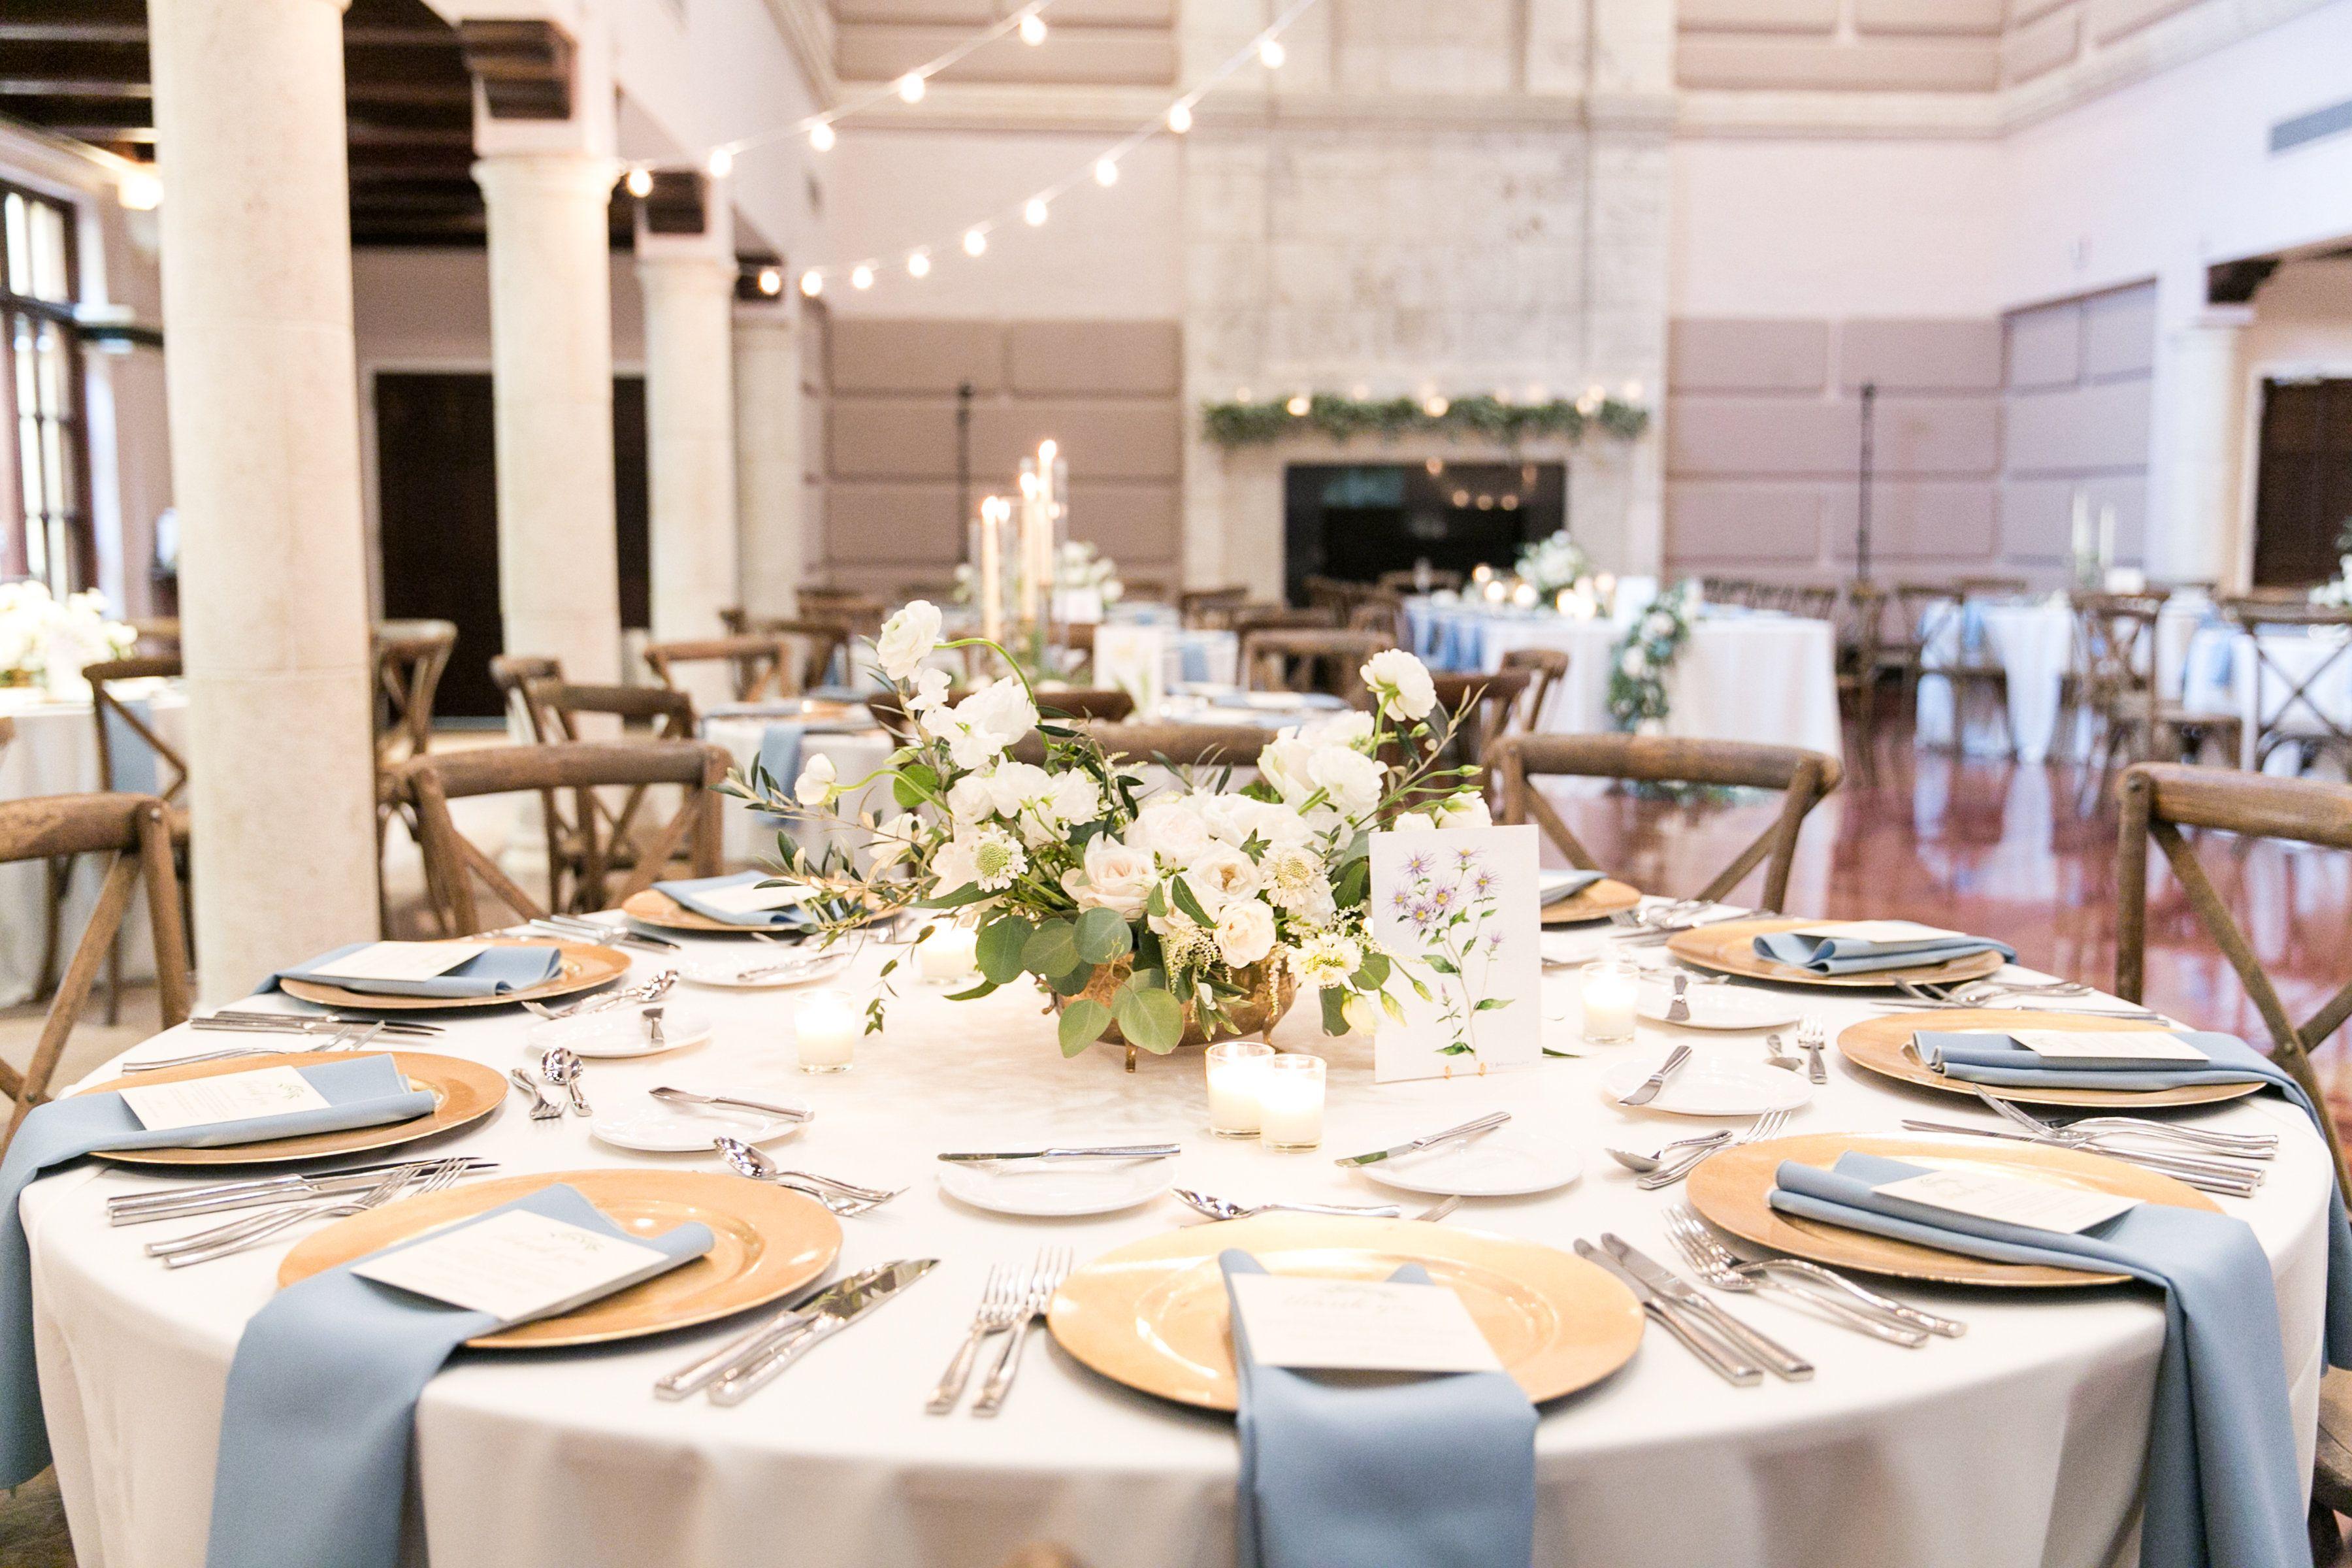 Lush Reception Table Arrangement Of White Cloud Garden Rose White Lisianthus White Scabiosa Whi Blue Gold Wedding Blue Table Settings Wedding Place Settings